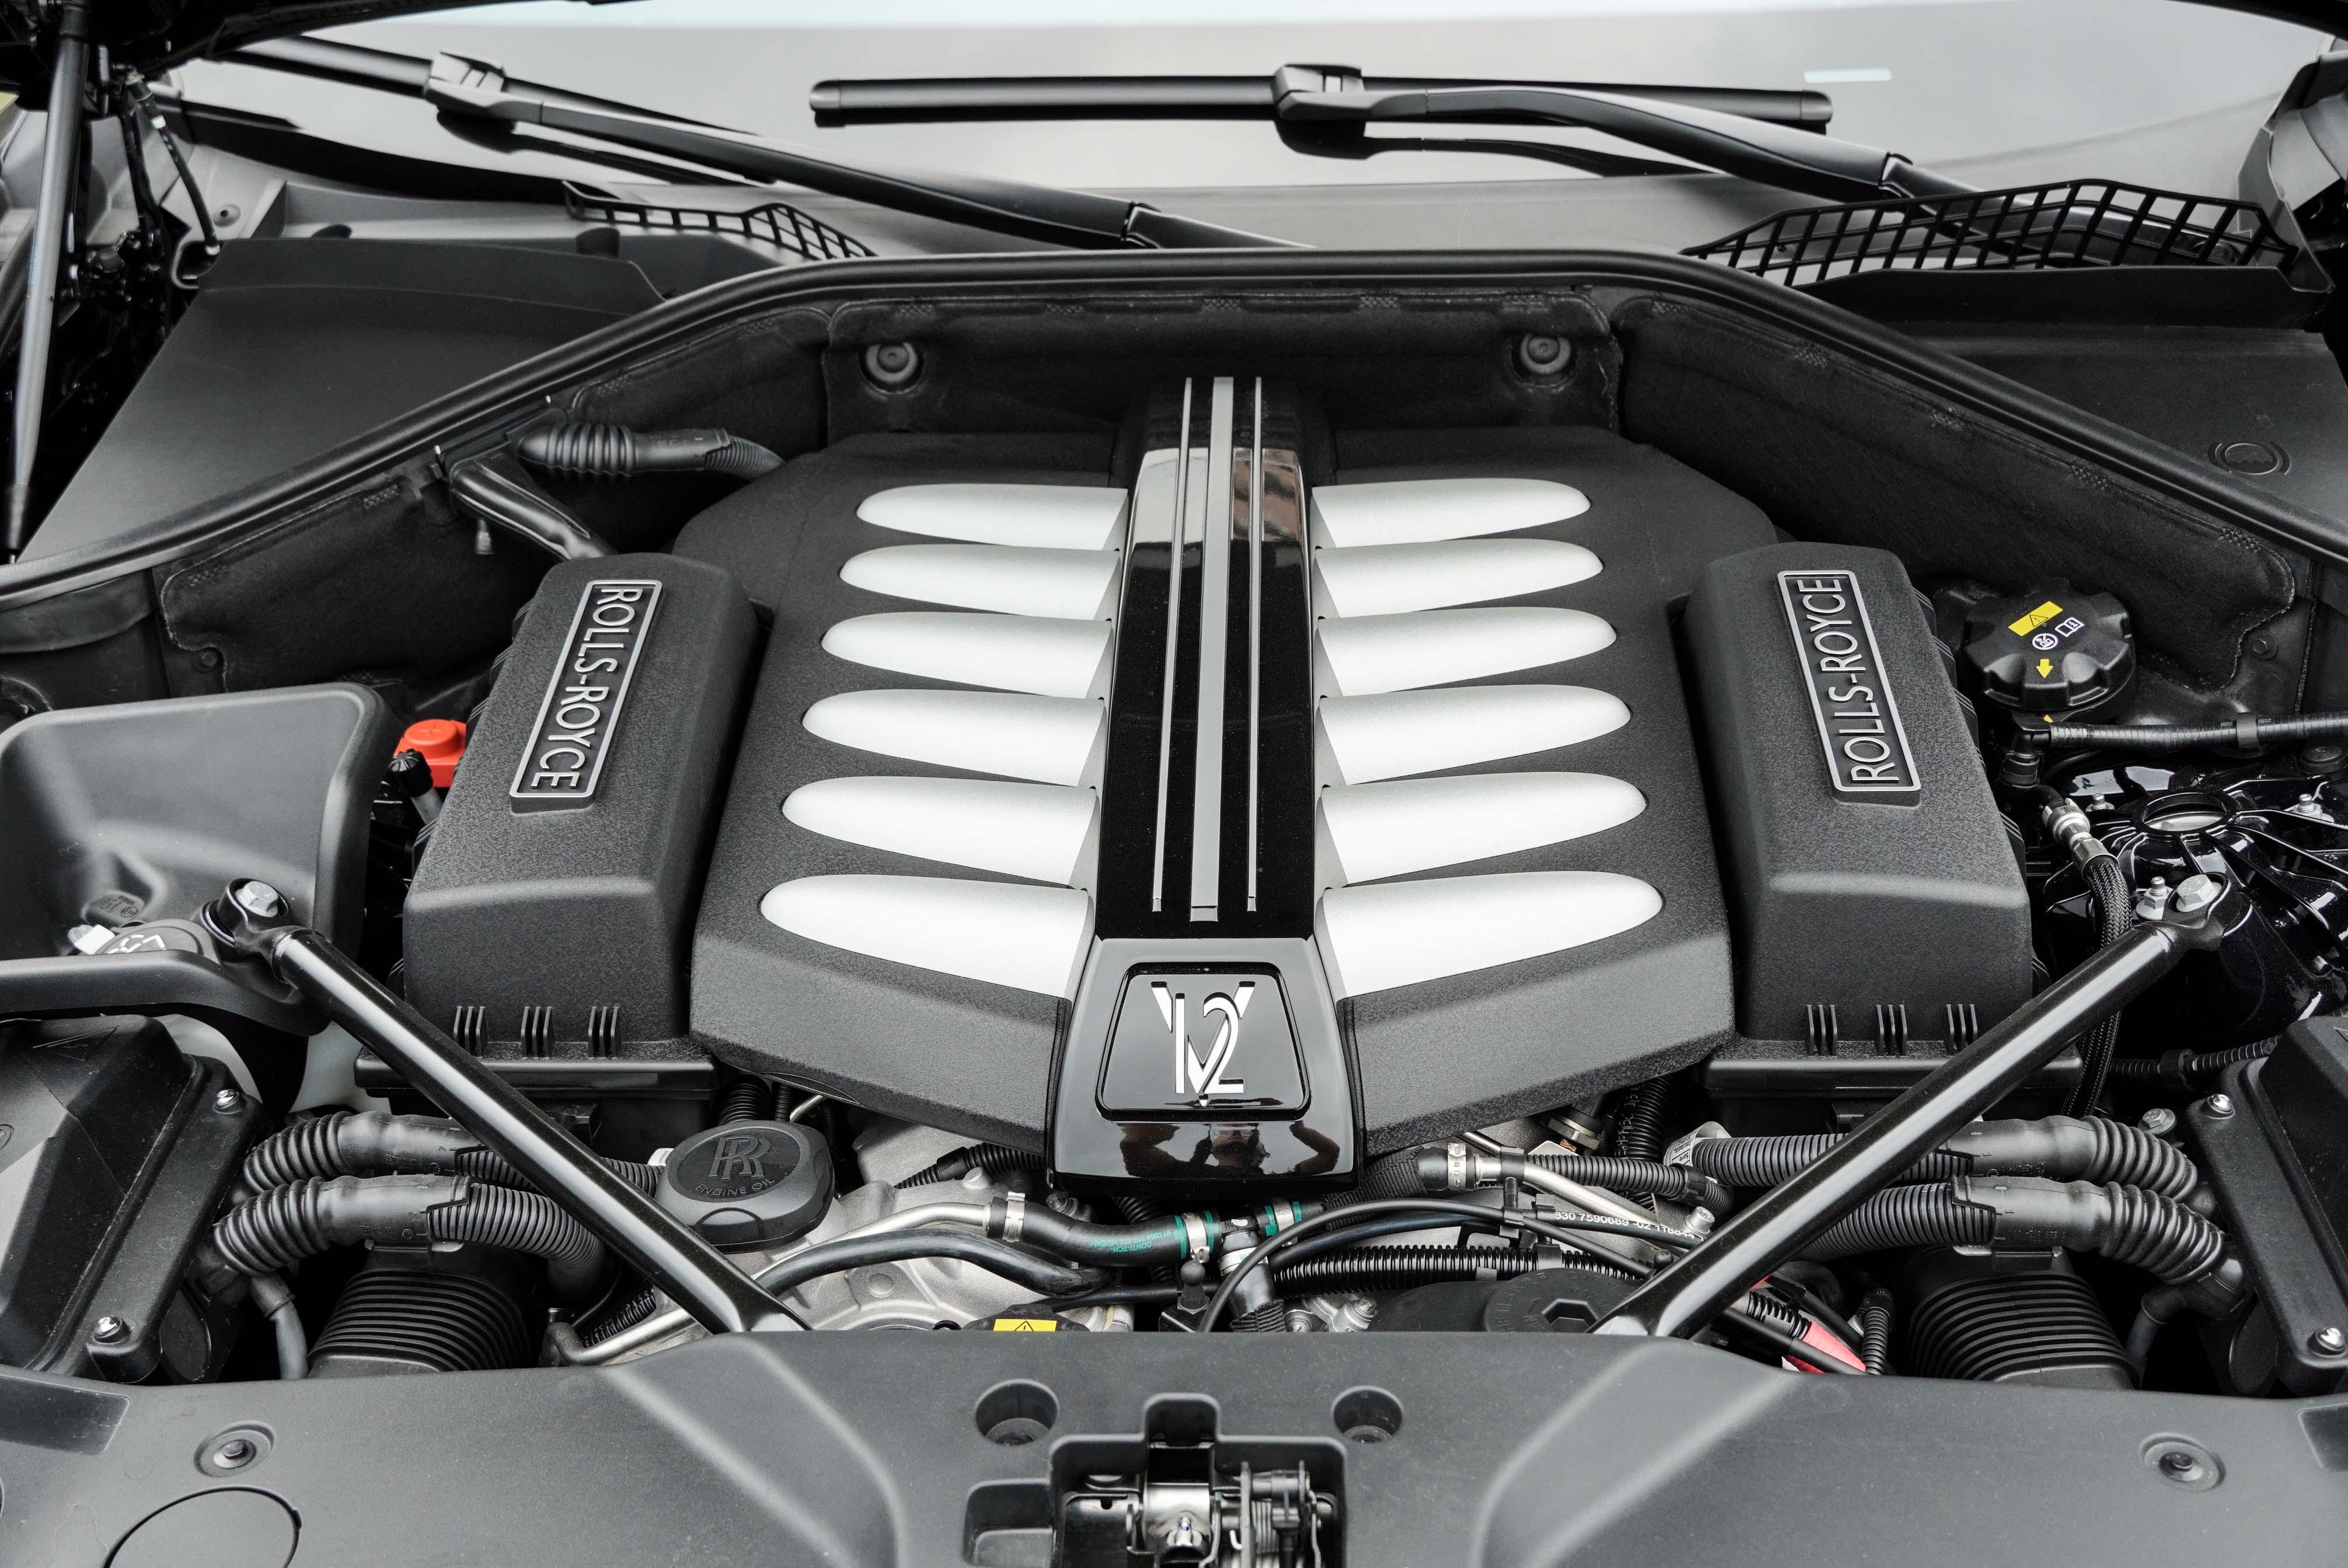 V12 渦輪增壓引擎具備 624 匹馬力及 800 牛頓米扭力。